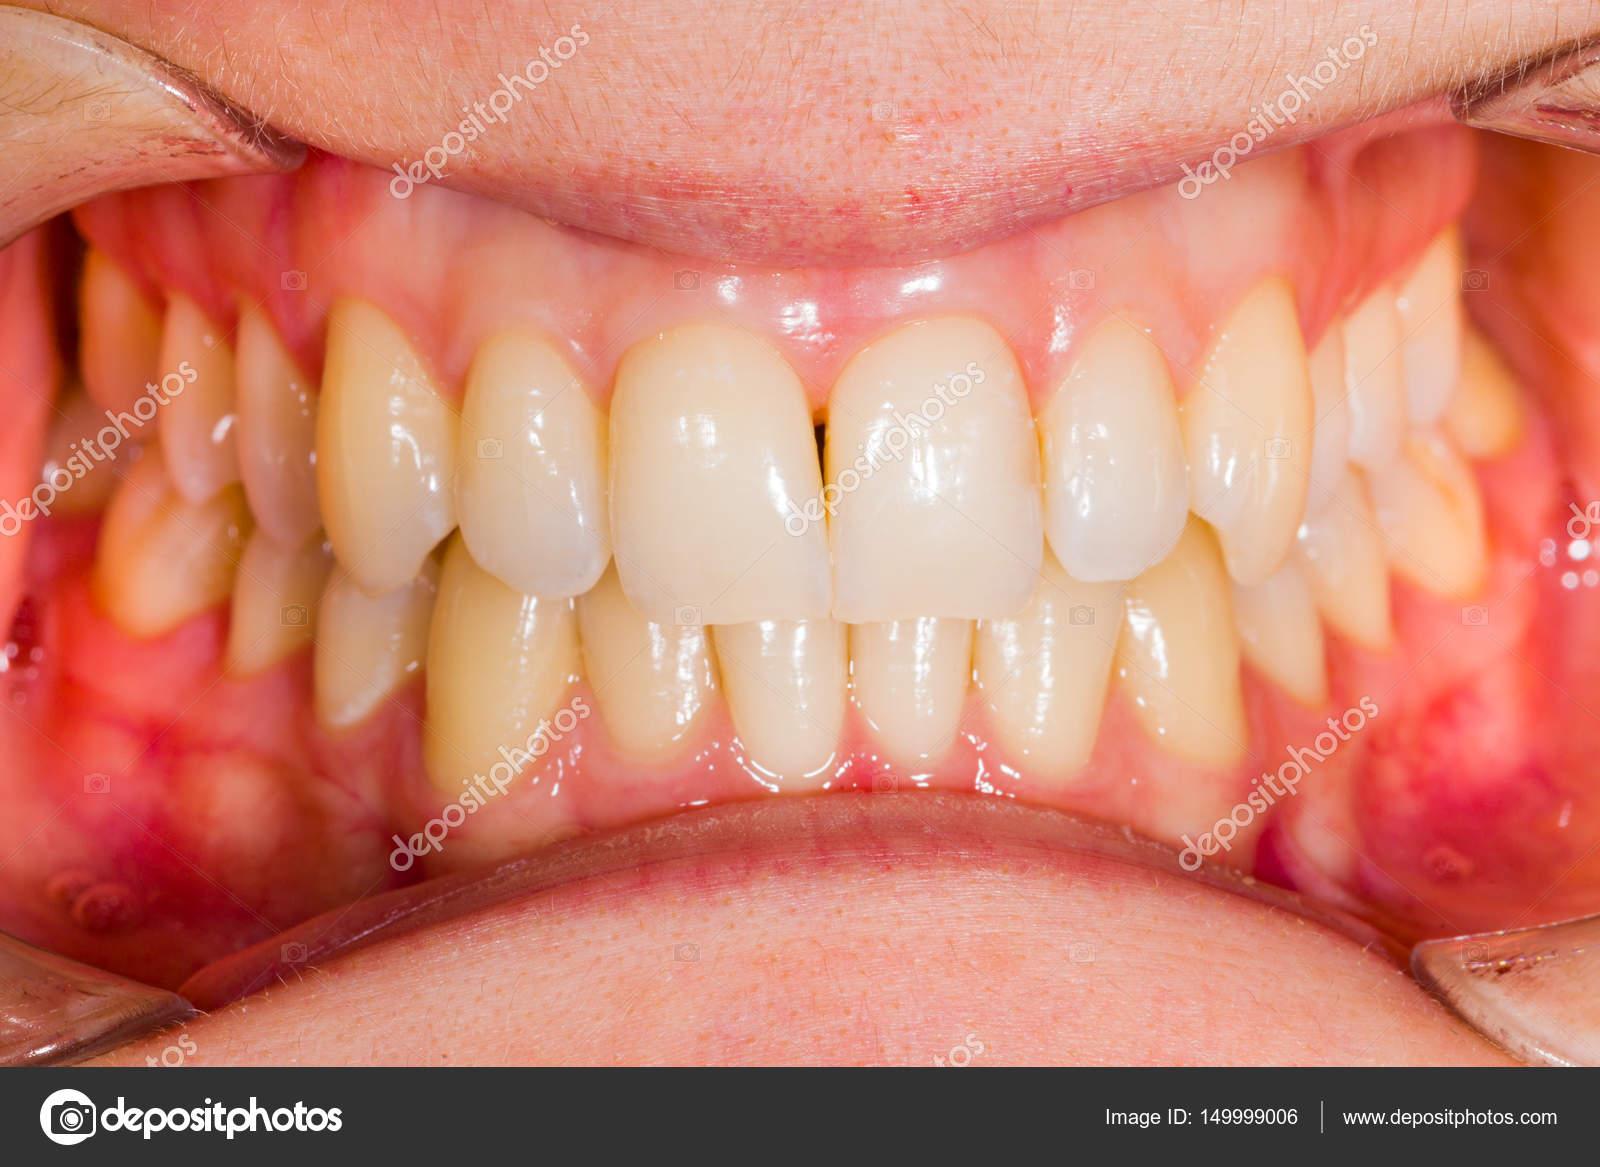 Zahnärztliche Anatomie — Stockfoto © Lighthunter #149999006